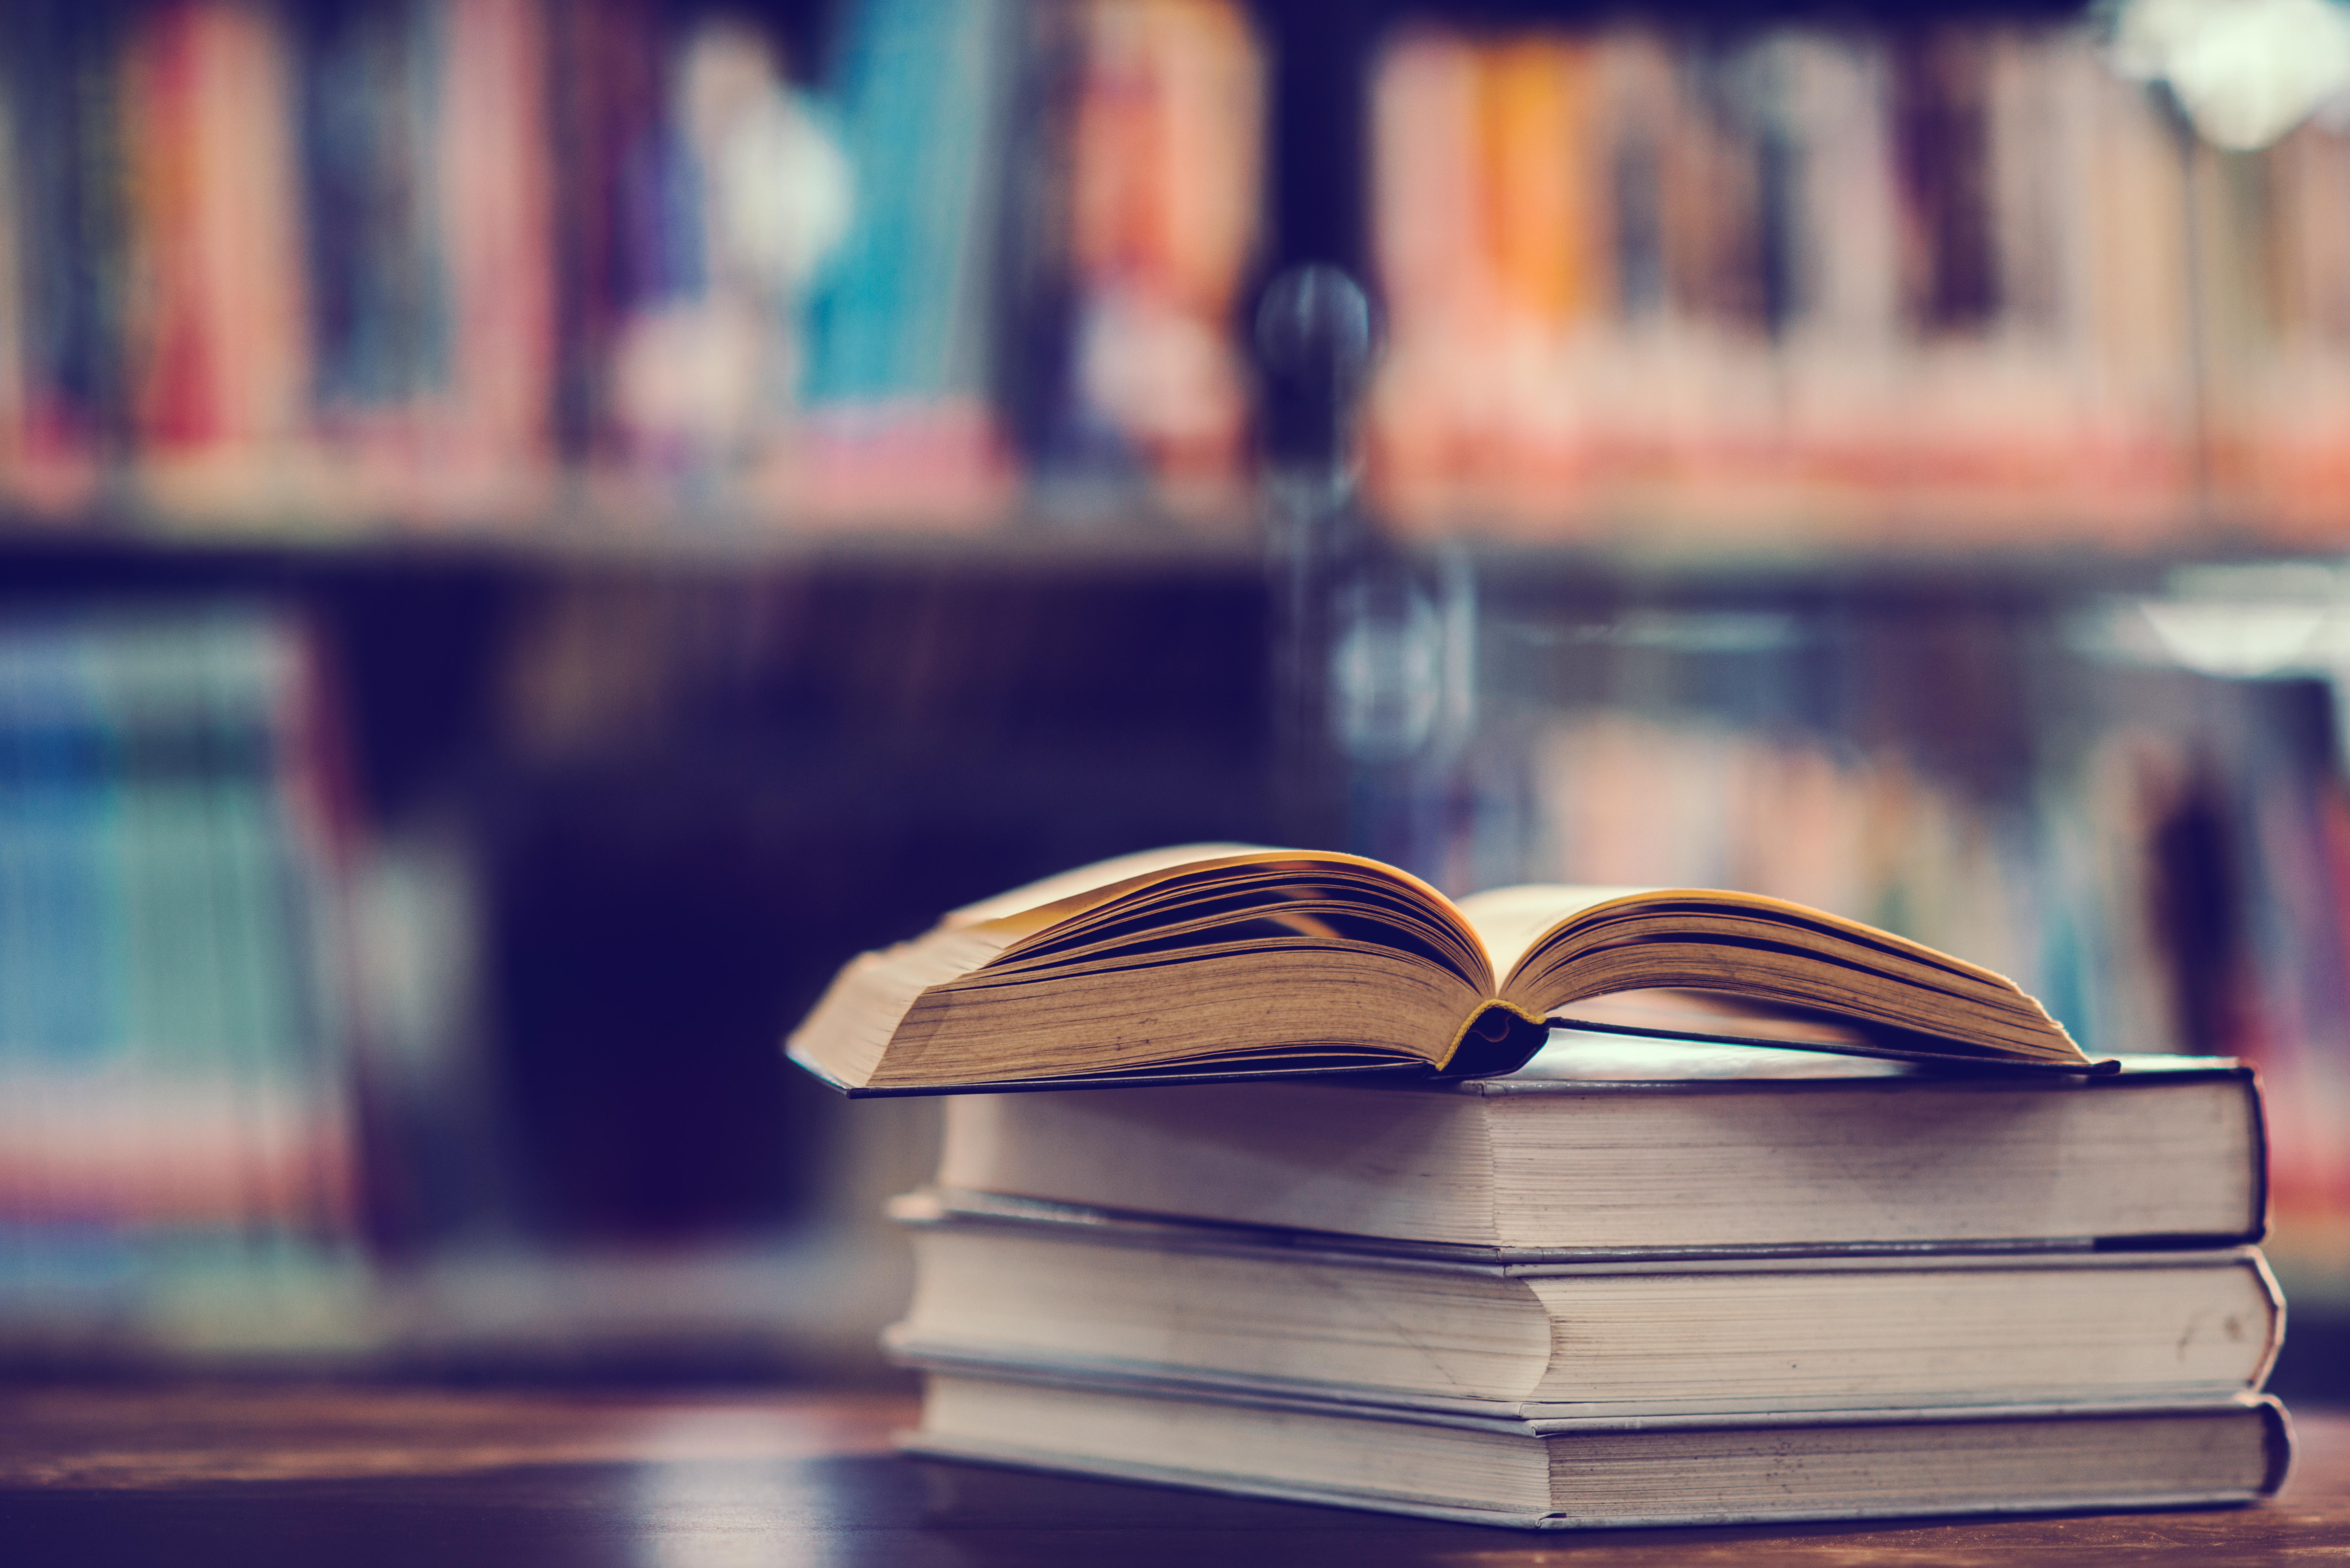 Sederet Jurusan Kuliah yang Hanya Ada Satu di Indonesia, dari Astronomi Hingga Jamu, Tertarik?